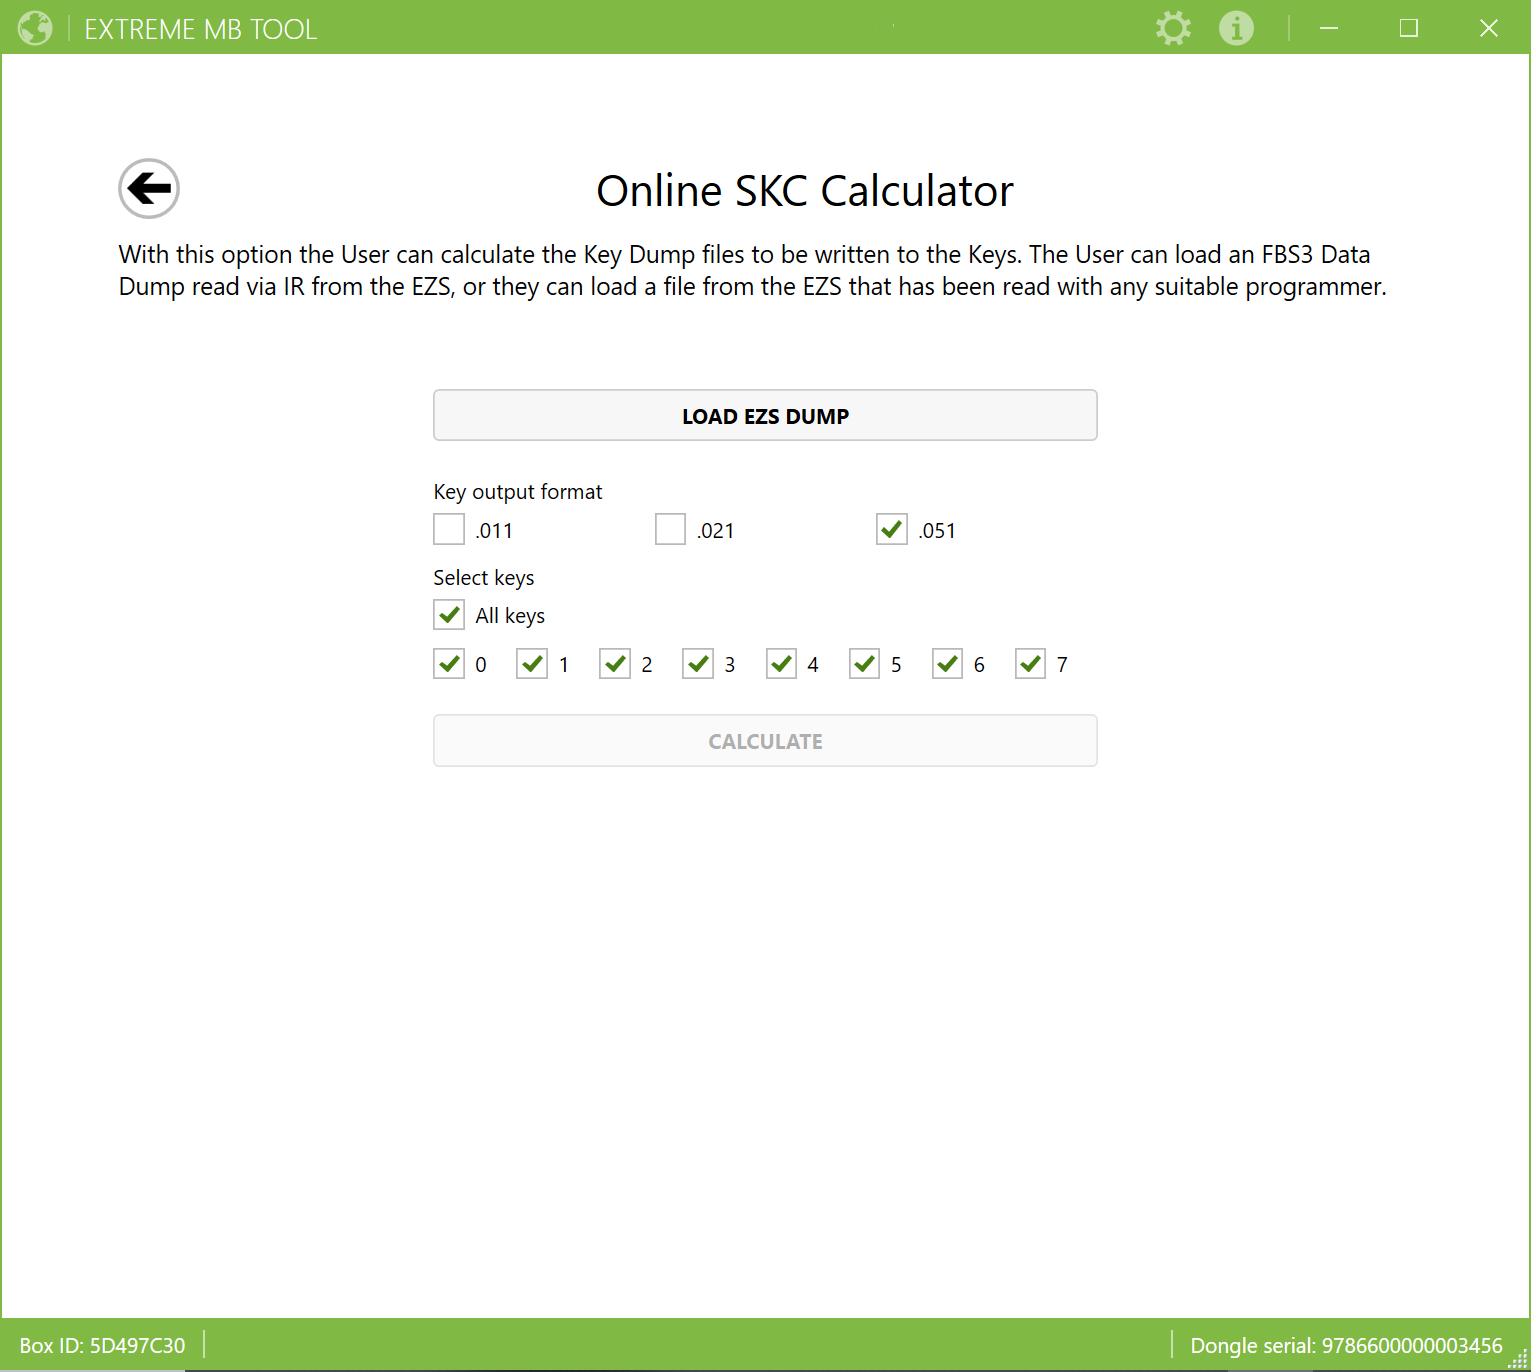 Online SKC Calculator